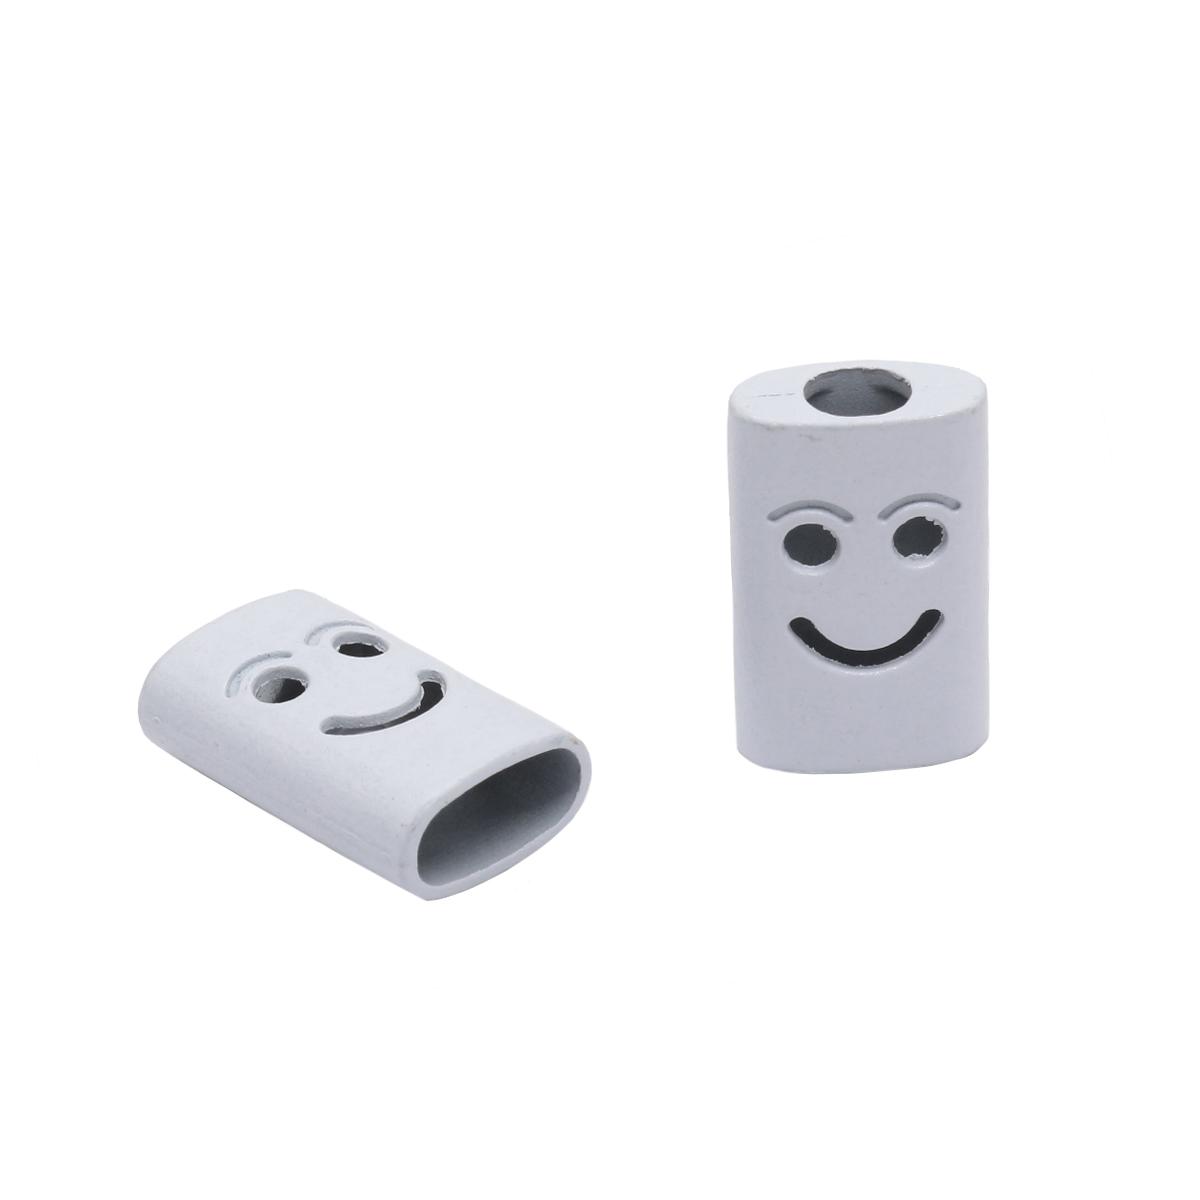 3AR435 Наконечник 'Smile' 17мм, металл, цвет белый